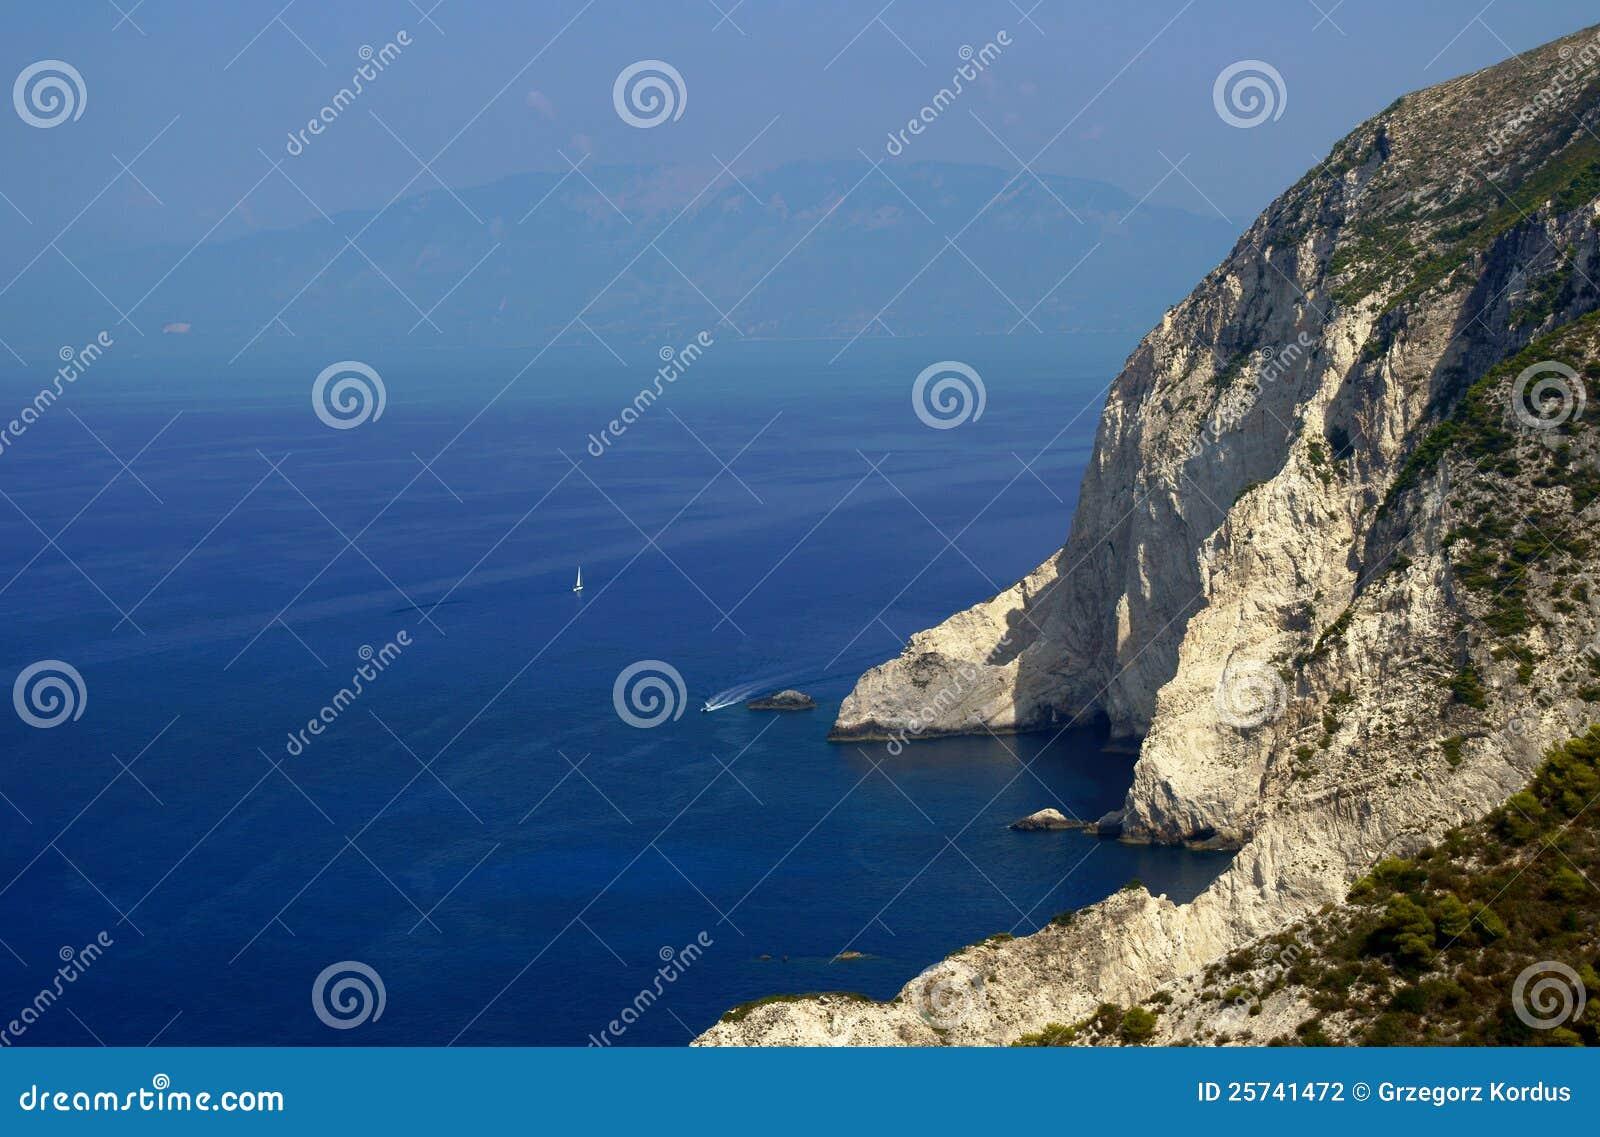 Sailboat and cliff, Zakynthos island